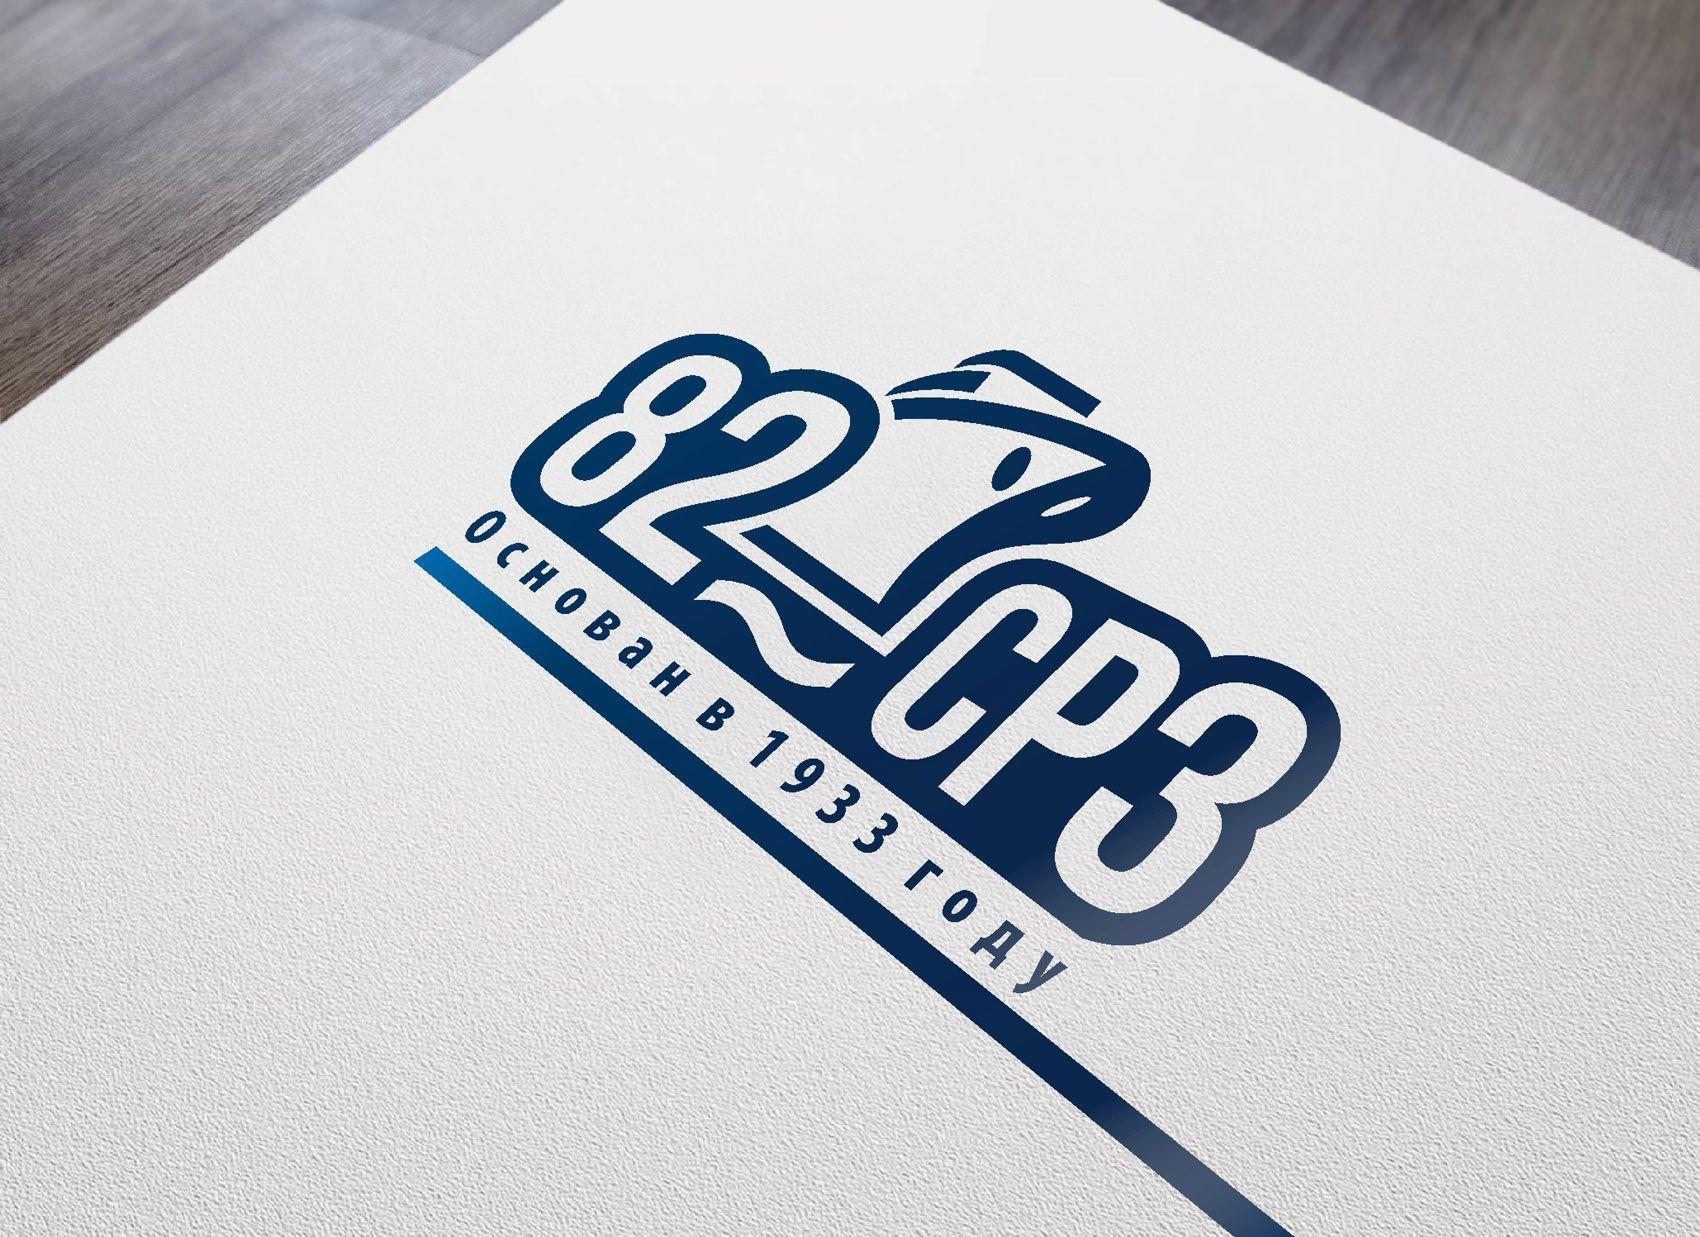 Логотип для судоремонтного завода - дизайнер Zheravin